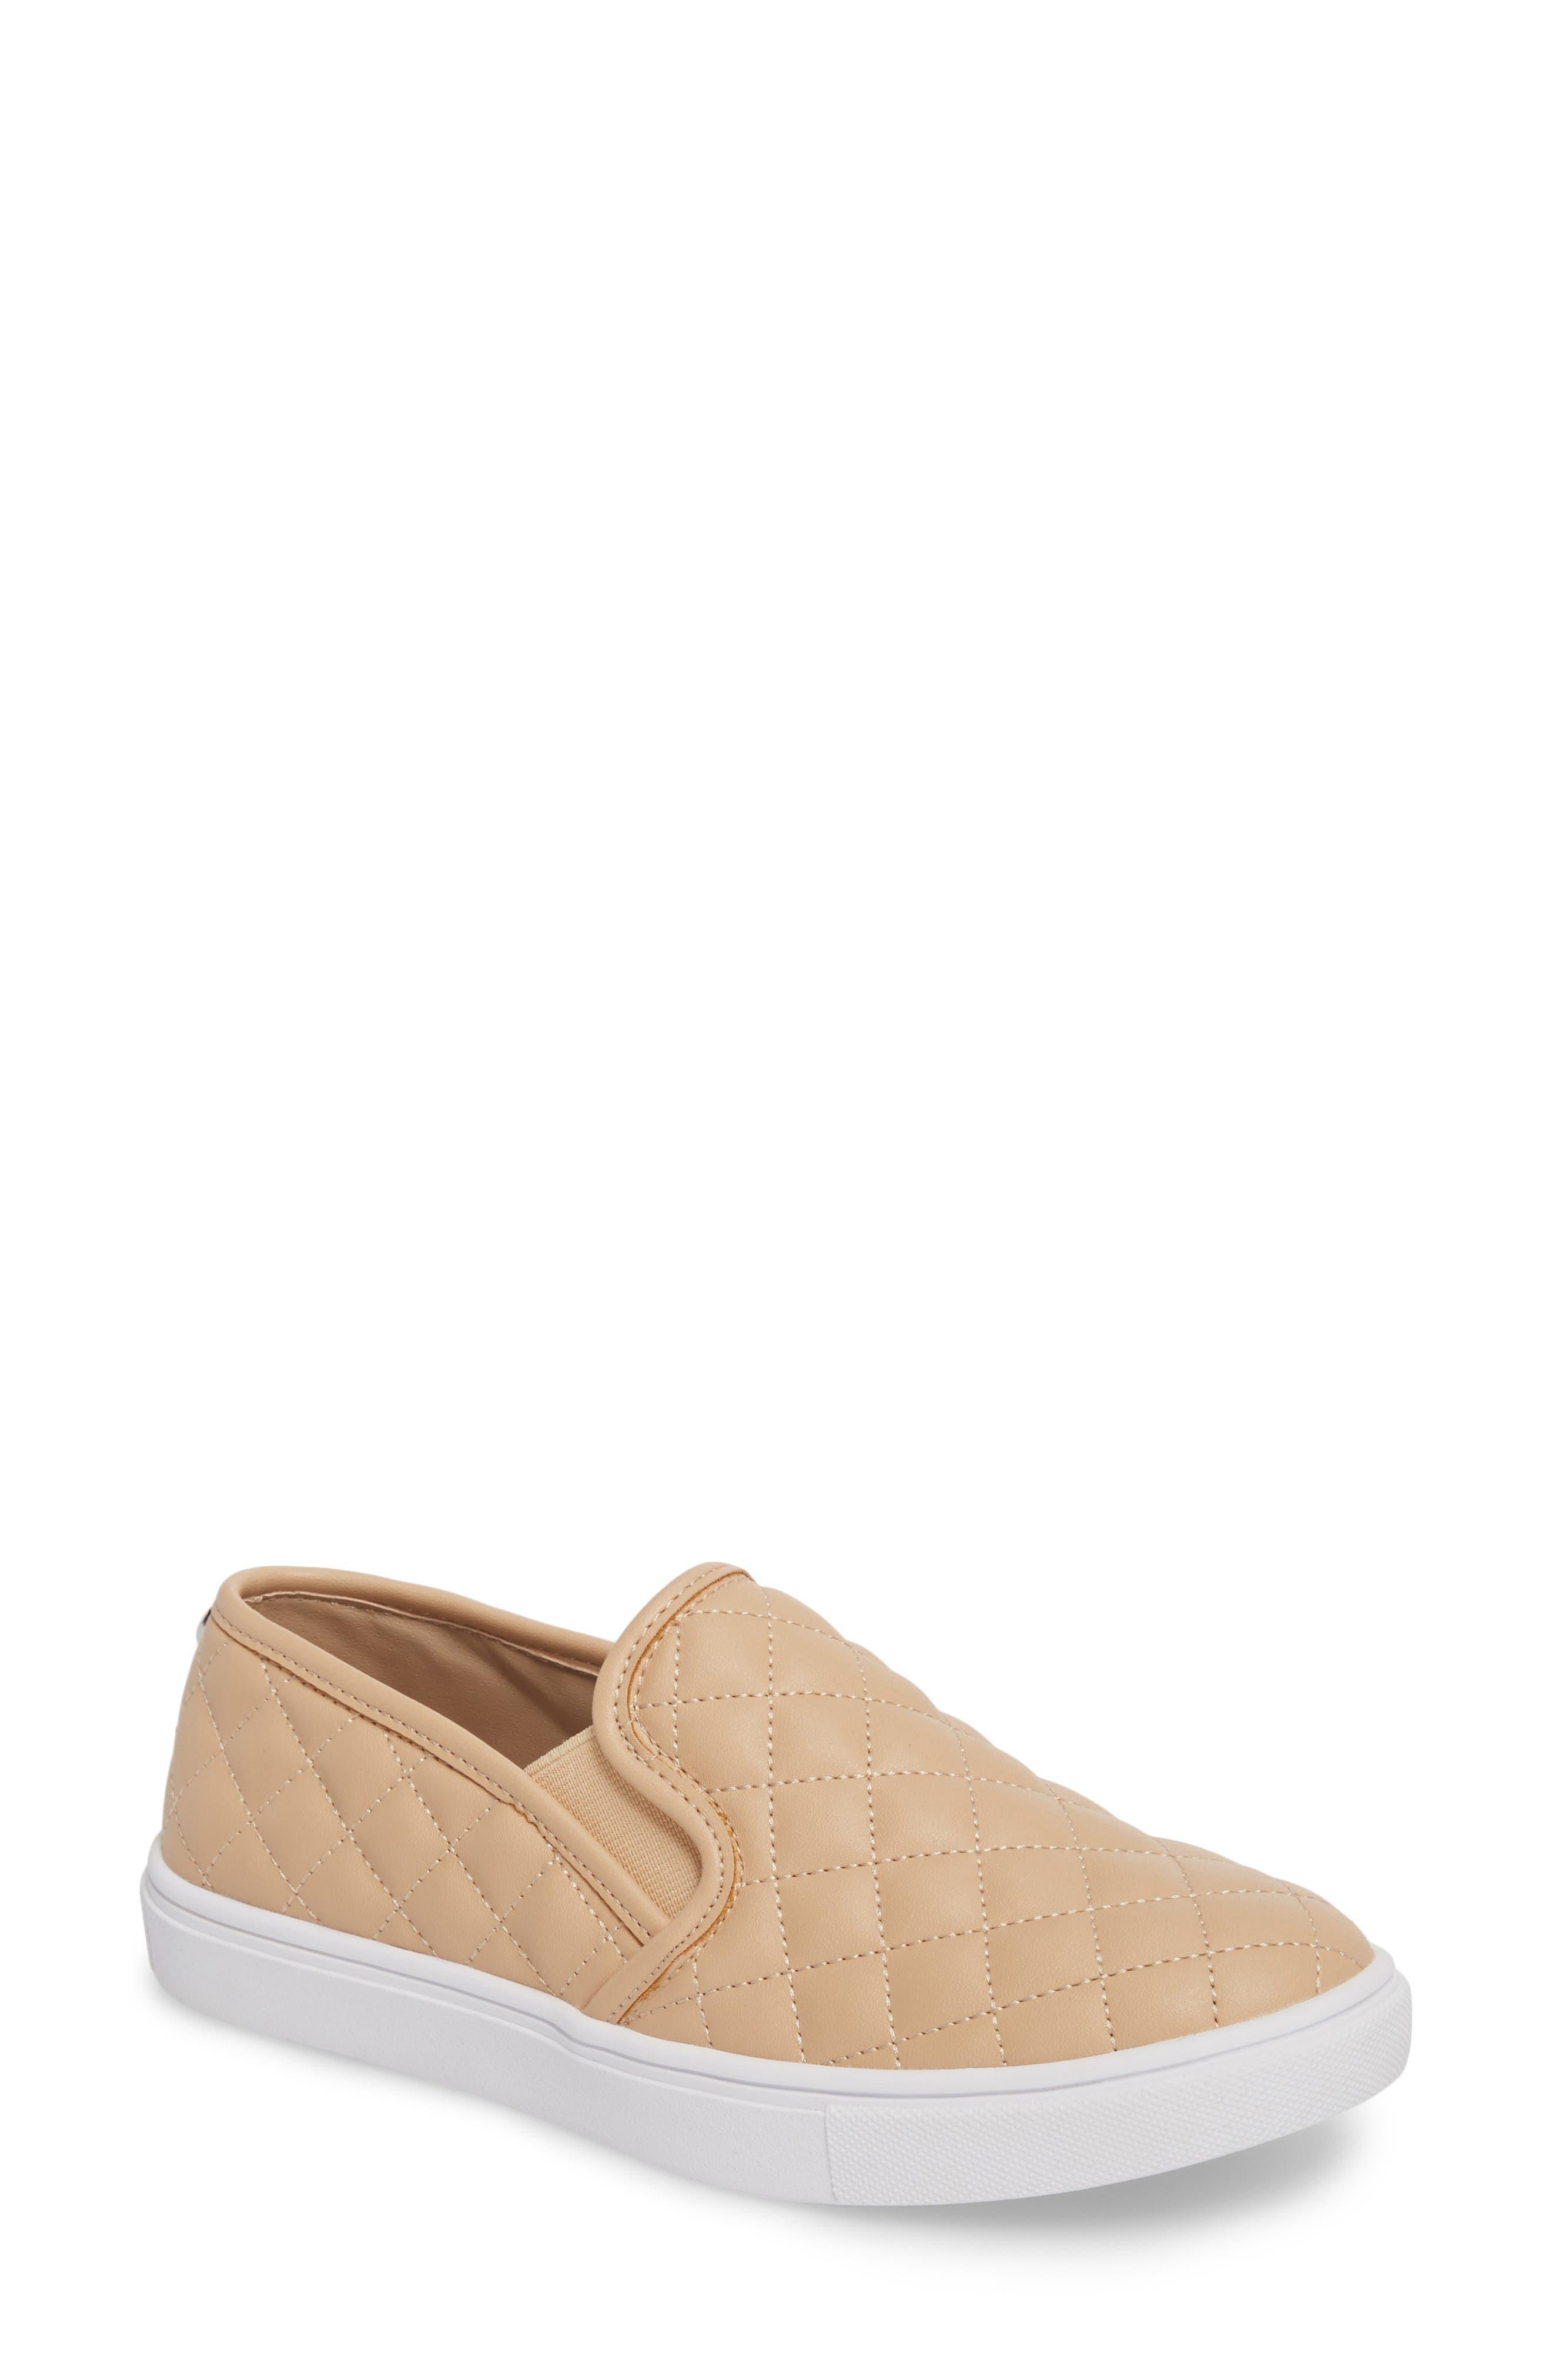 STEVE MADDEN Ecentrcq Sneaker, Main, color, 250